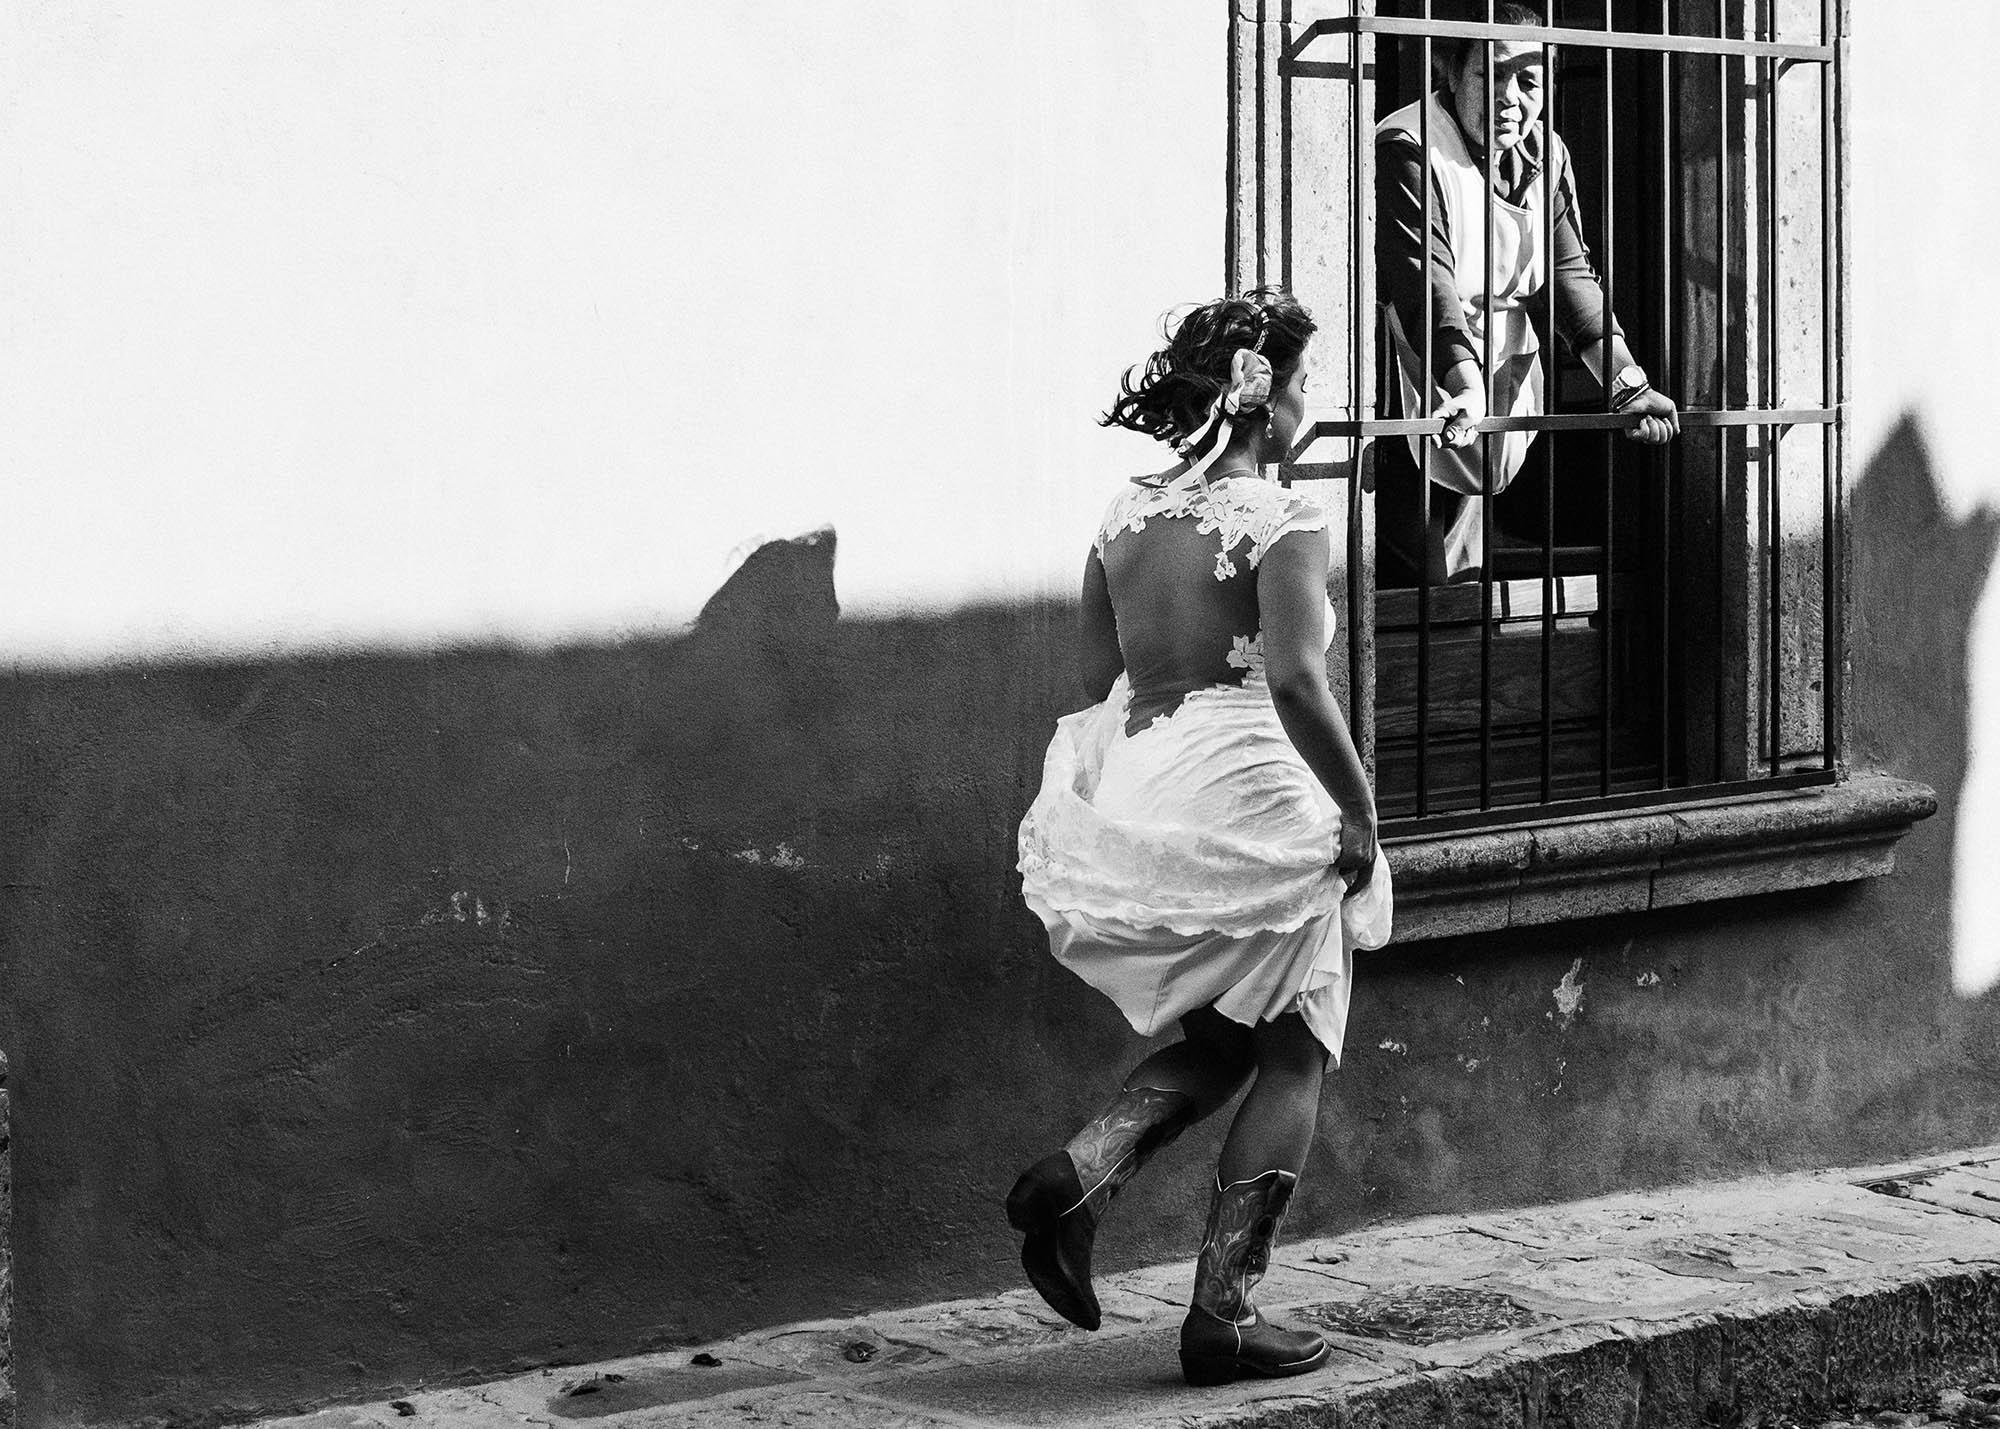 fotografo_de_bodas_san_miguel_allende_gto_24.JPG